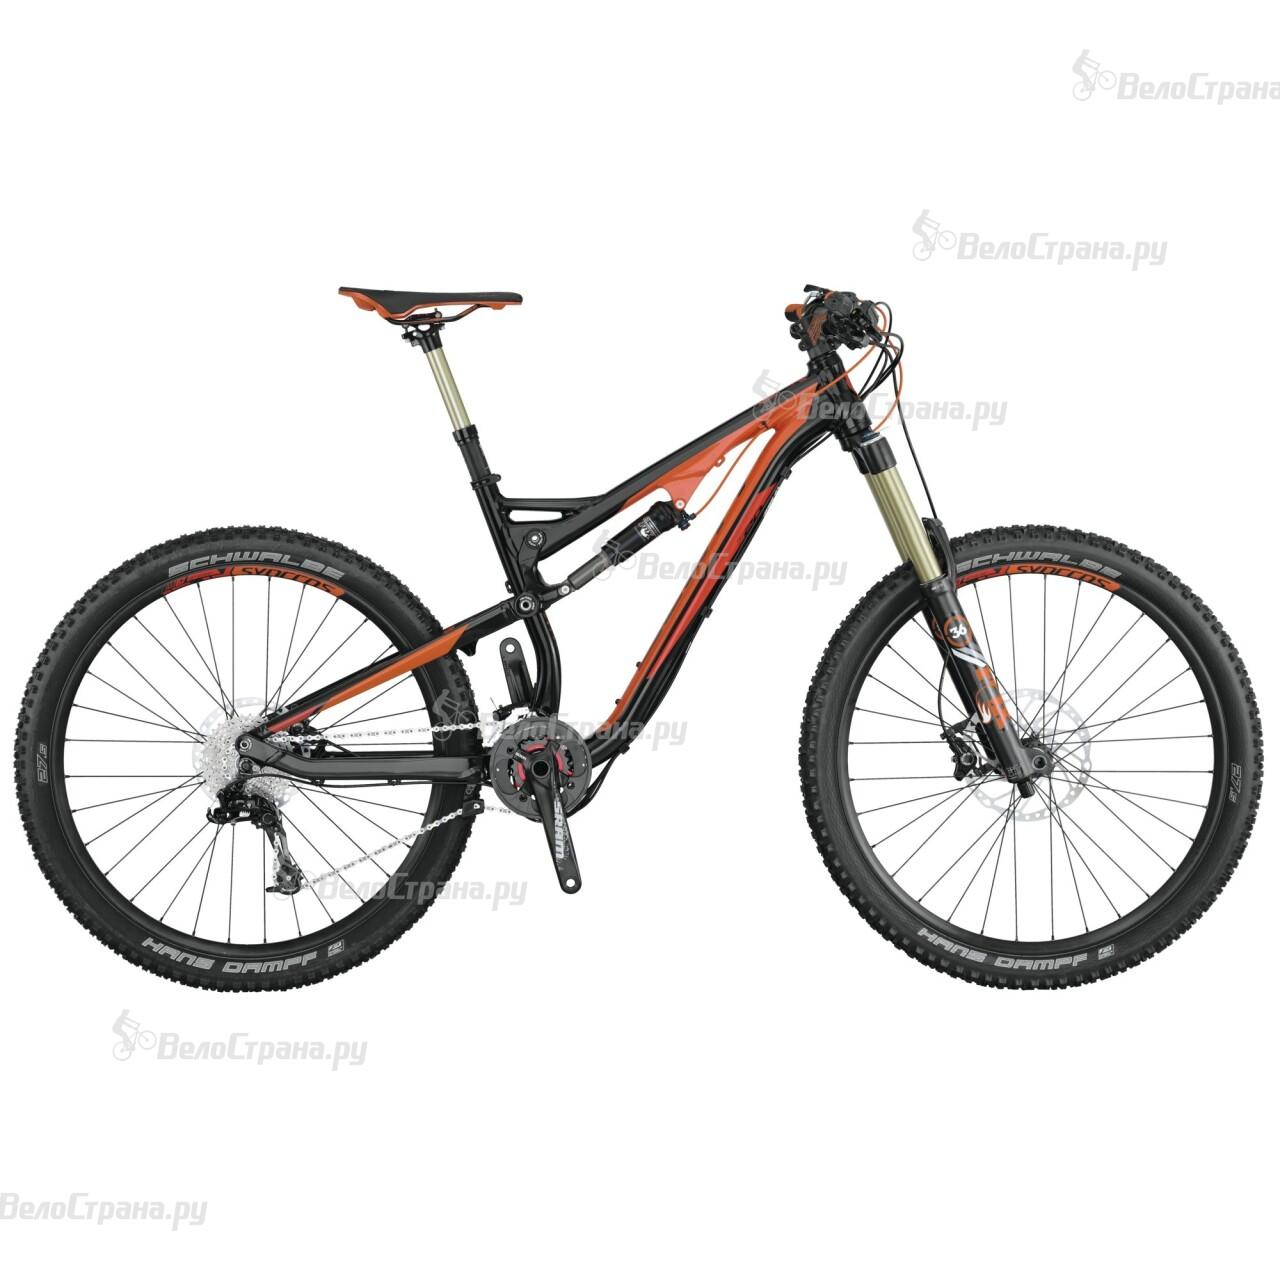 Велосипед Scott Genius LT 720 (2015) велосипед forward twister 2 0 disc 2016